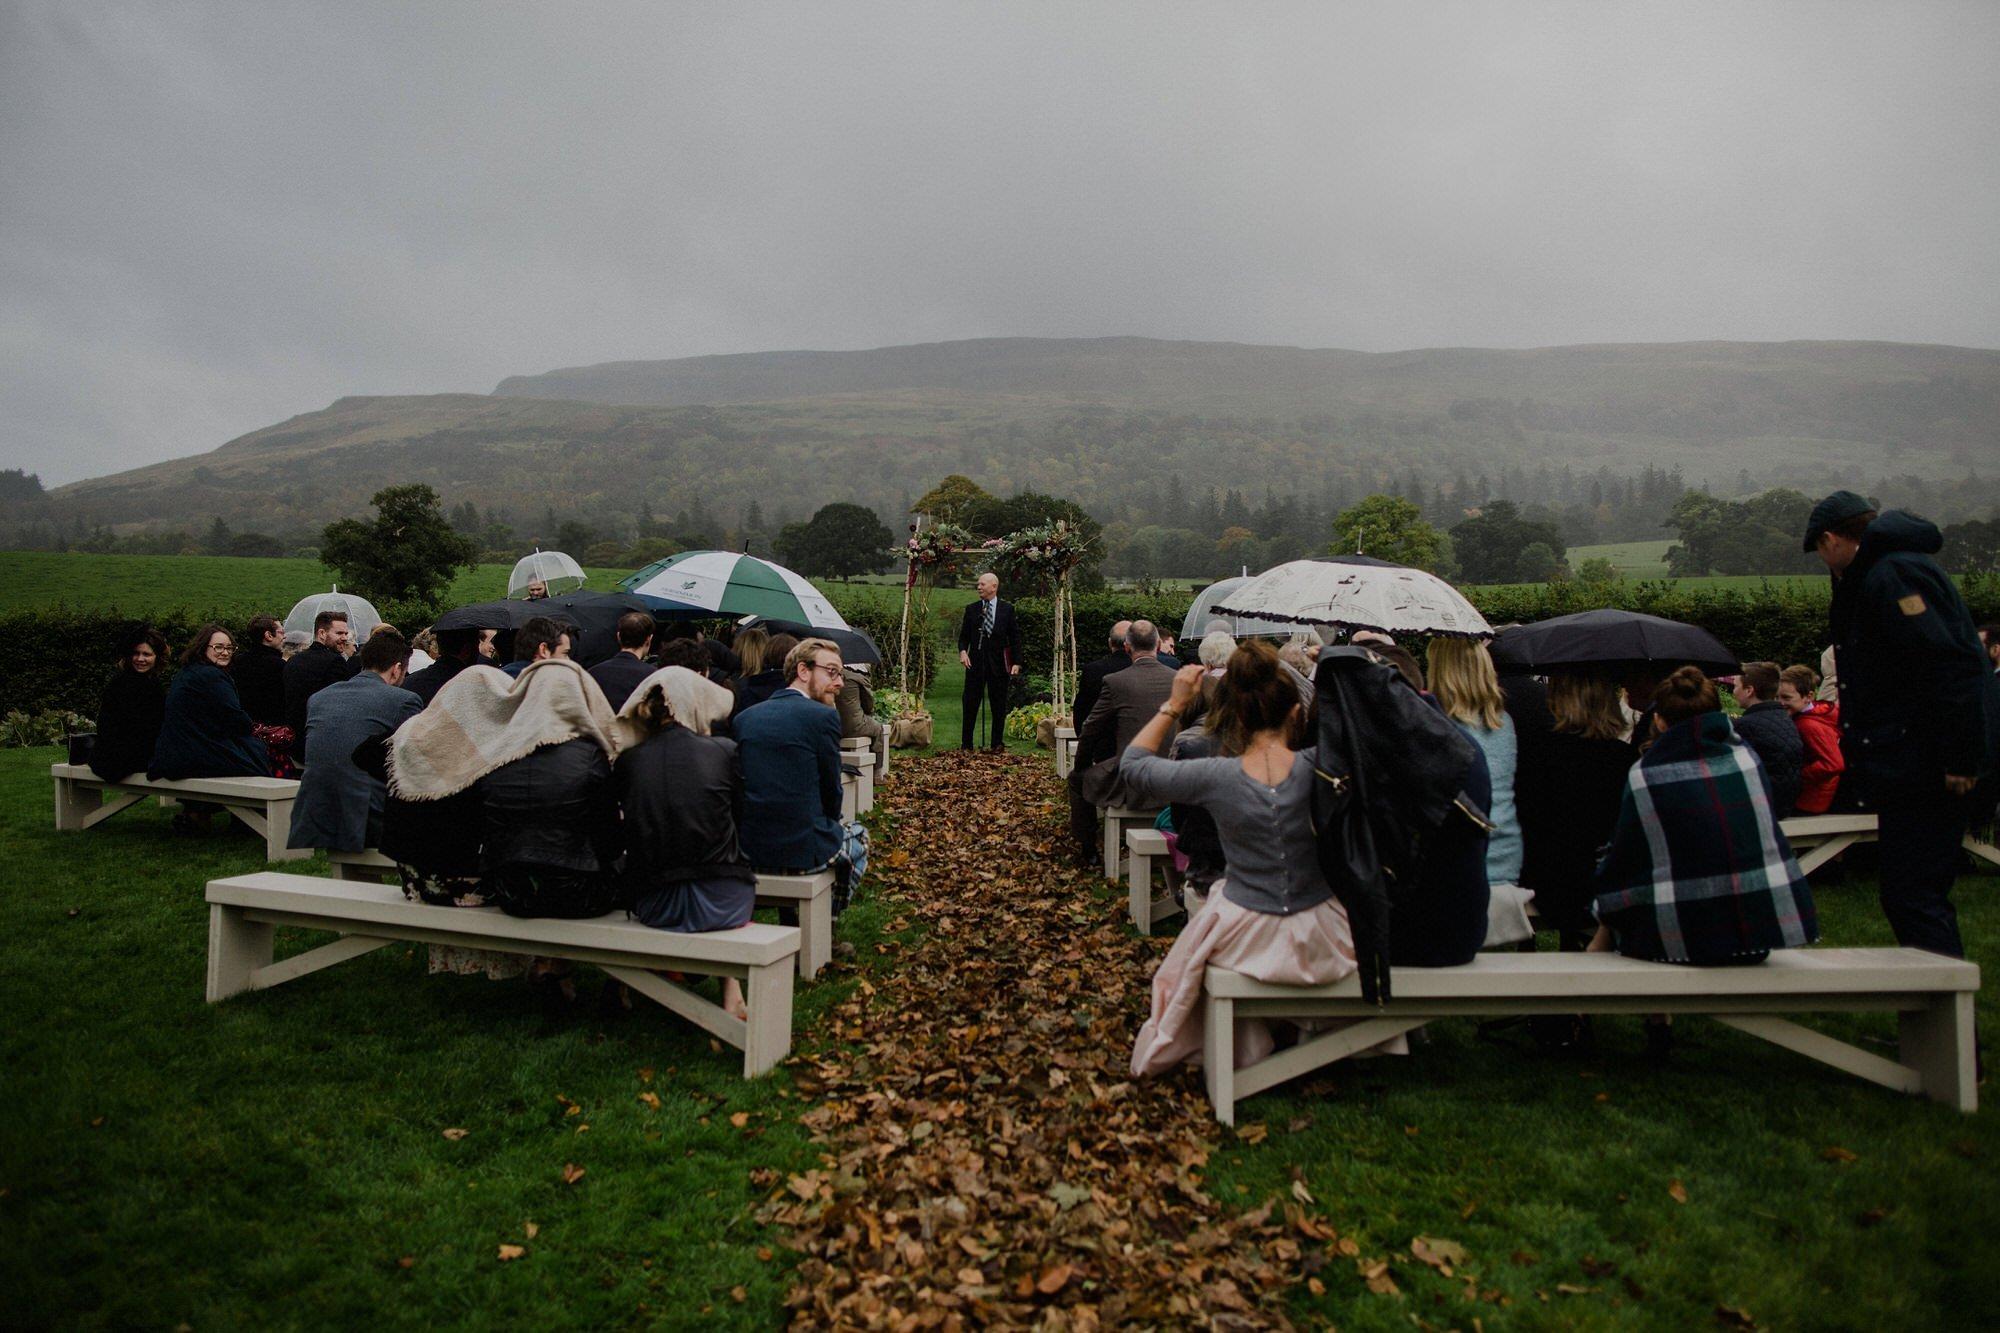 016 TIN SHED KNOCKRAICH FARM WEDDING ALTERNATIVE BRIDE ZOE ALEXANDRA PHOTOGRAPHY